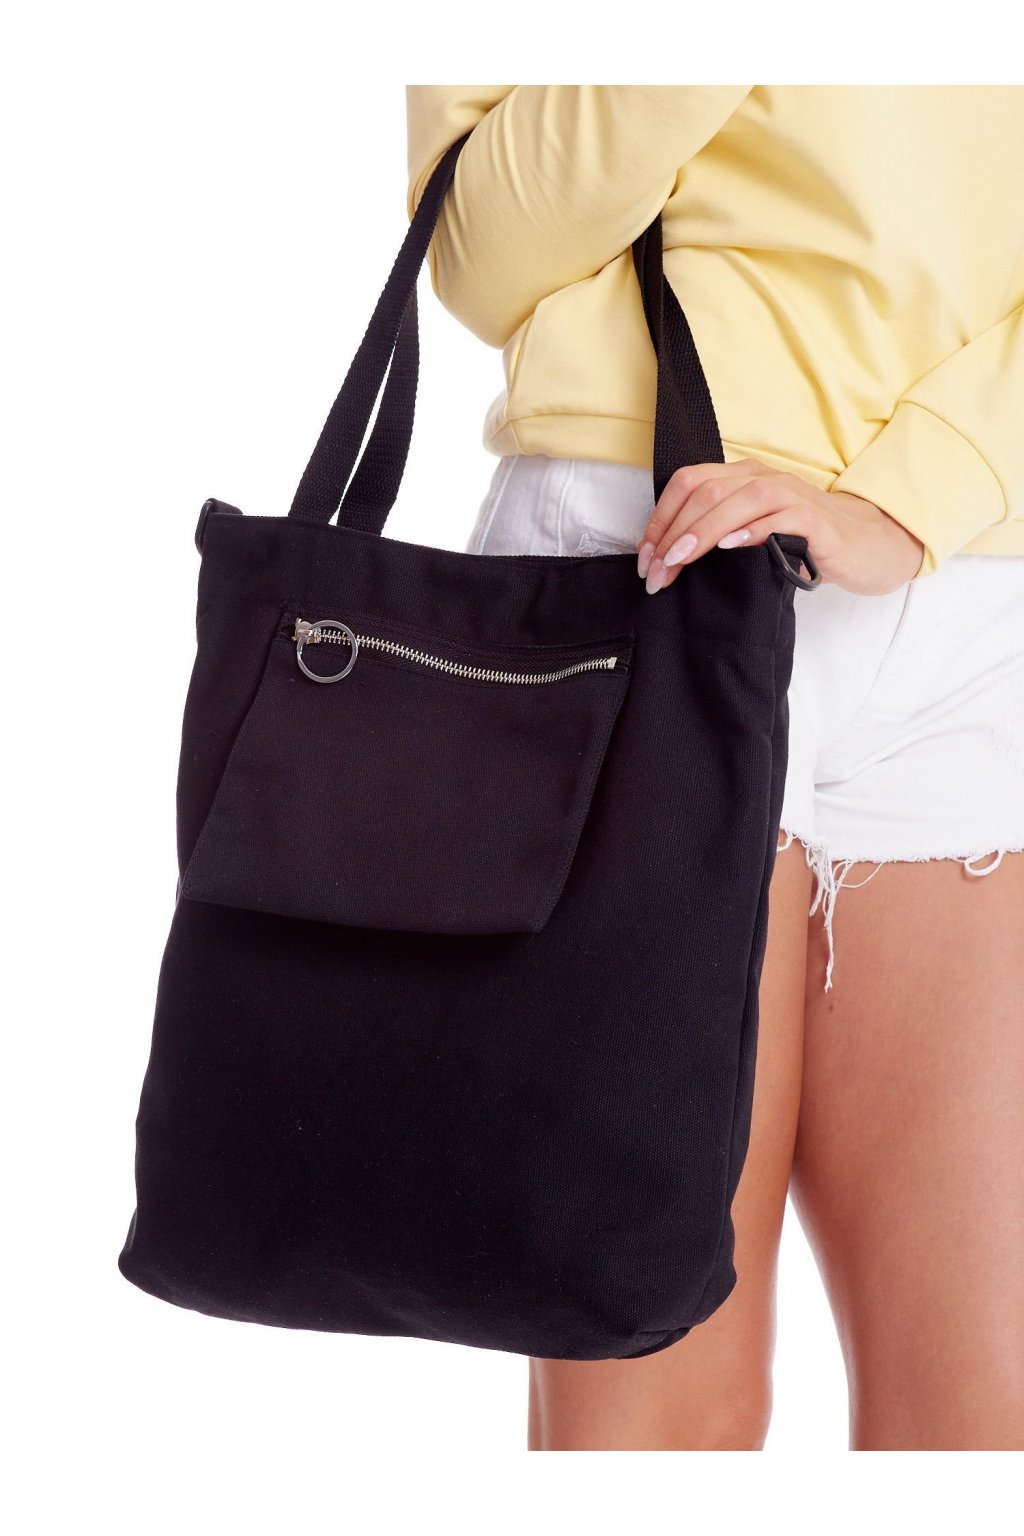 Textílna kabelka čierna kód YP-TR-DX4109.00